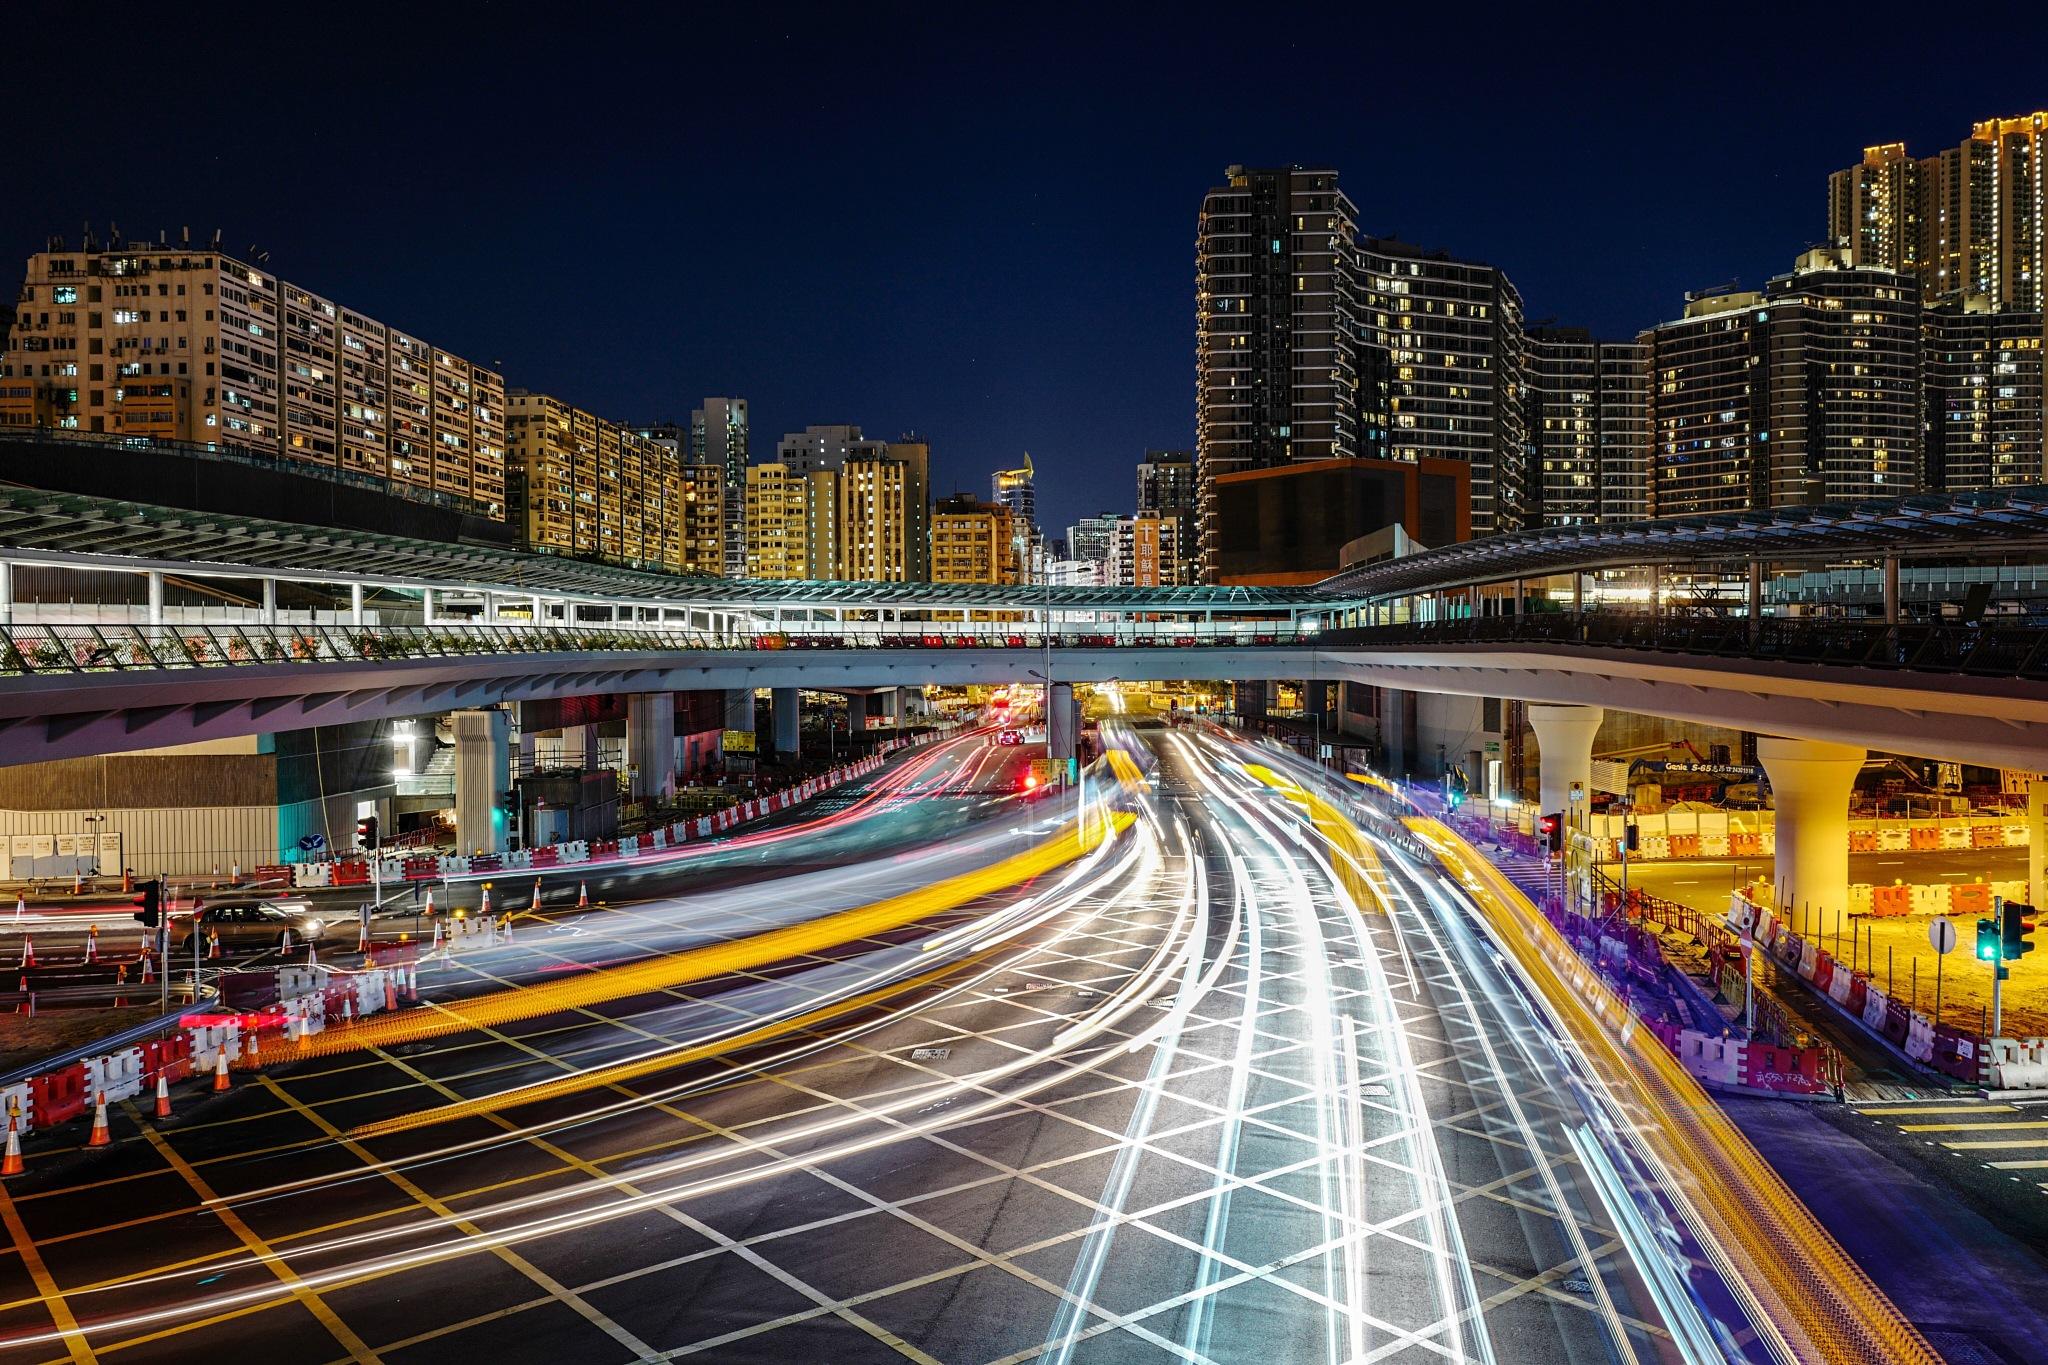 West Kowloon Night by zirosou